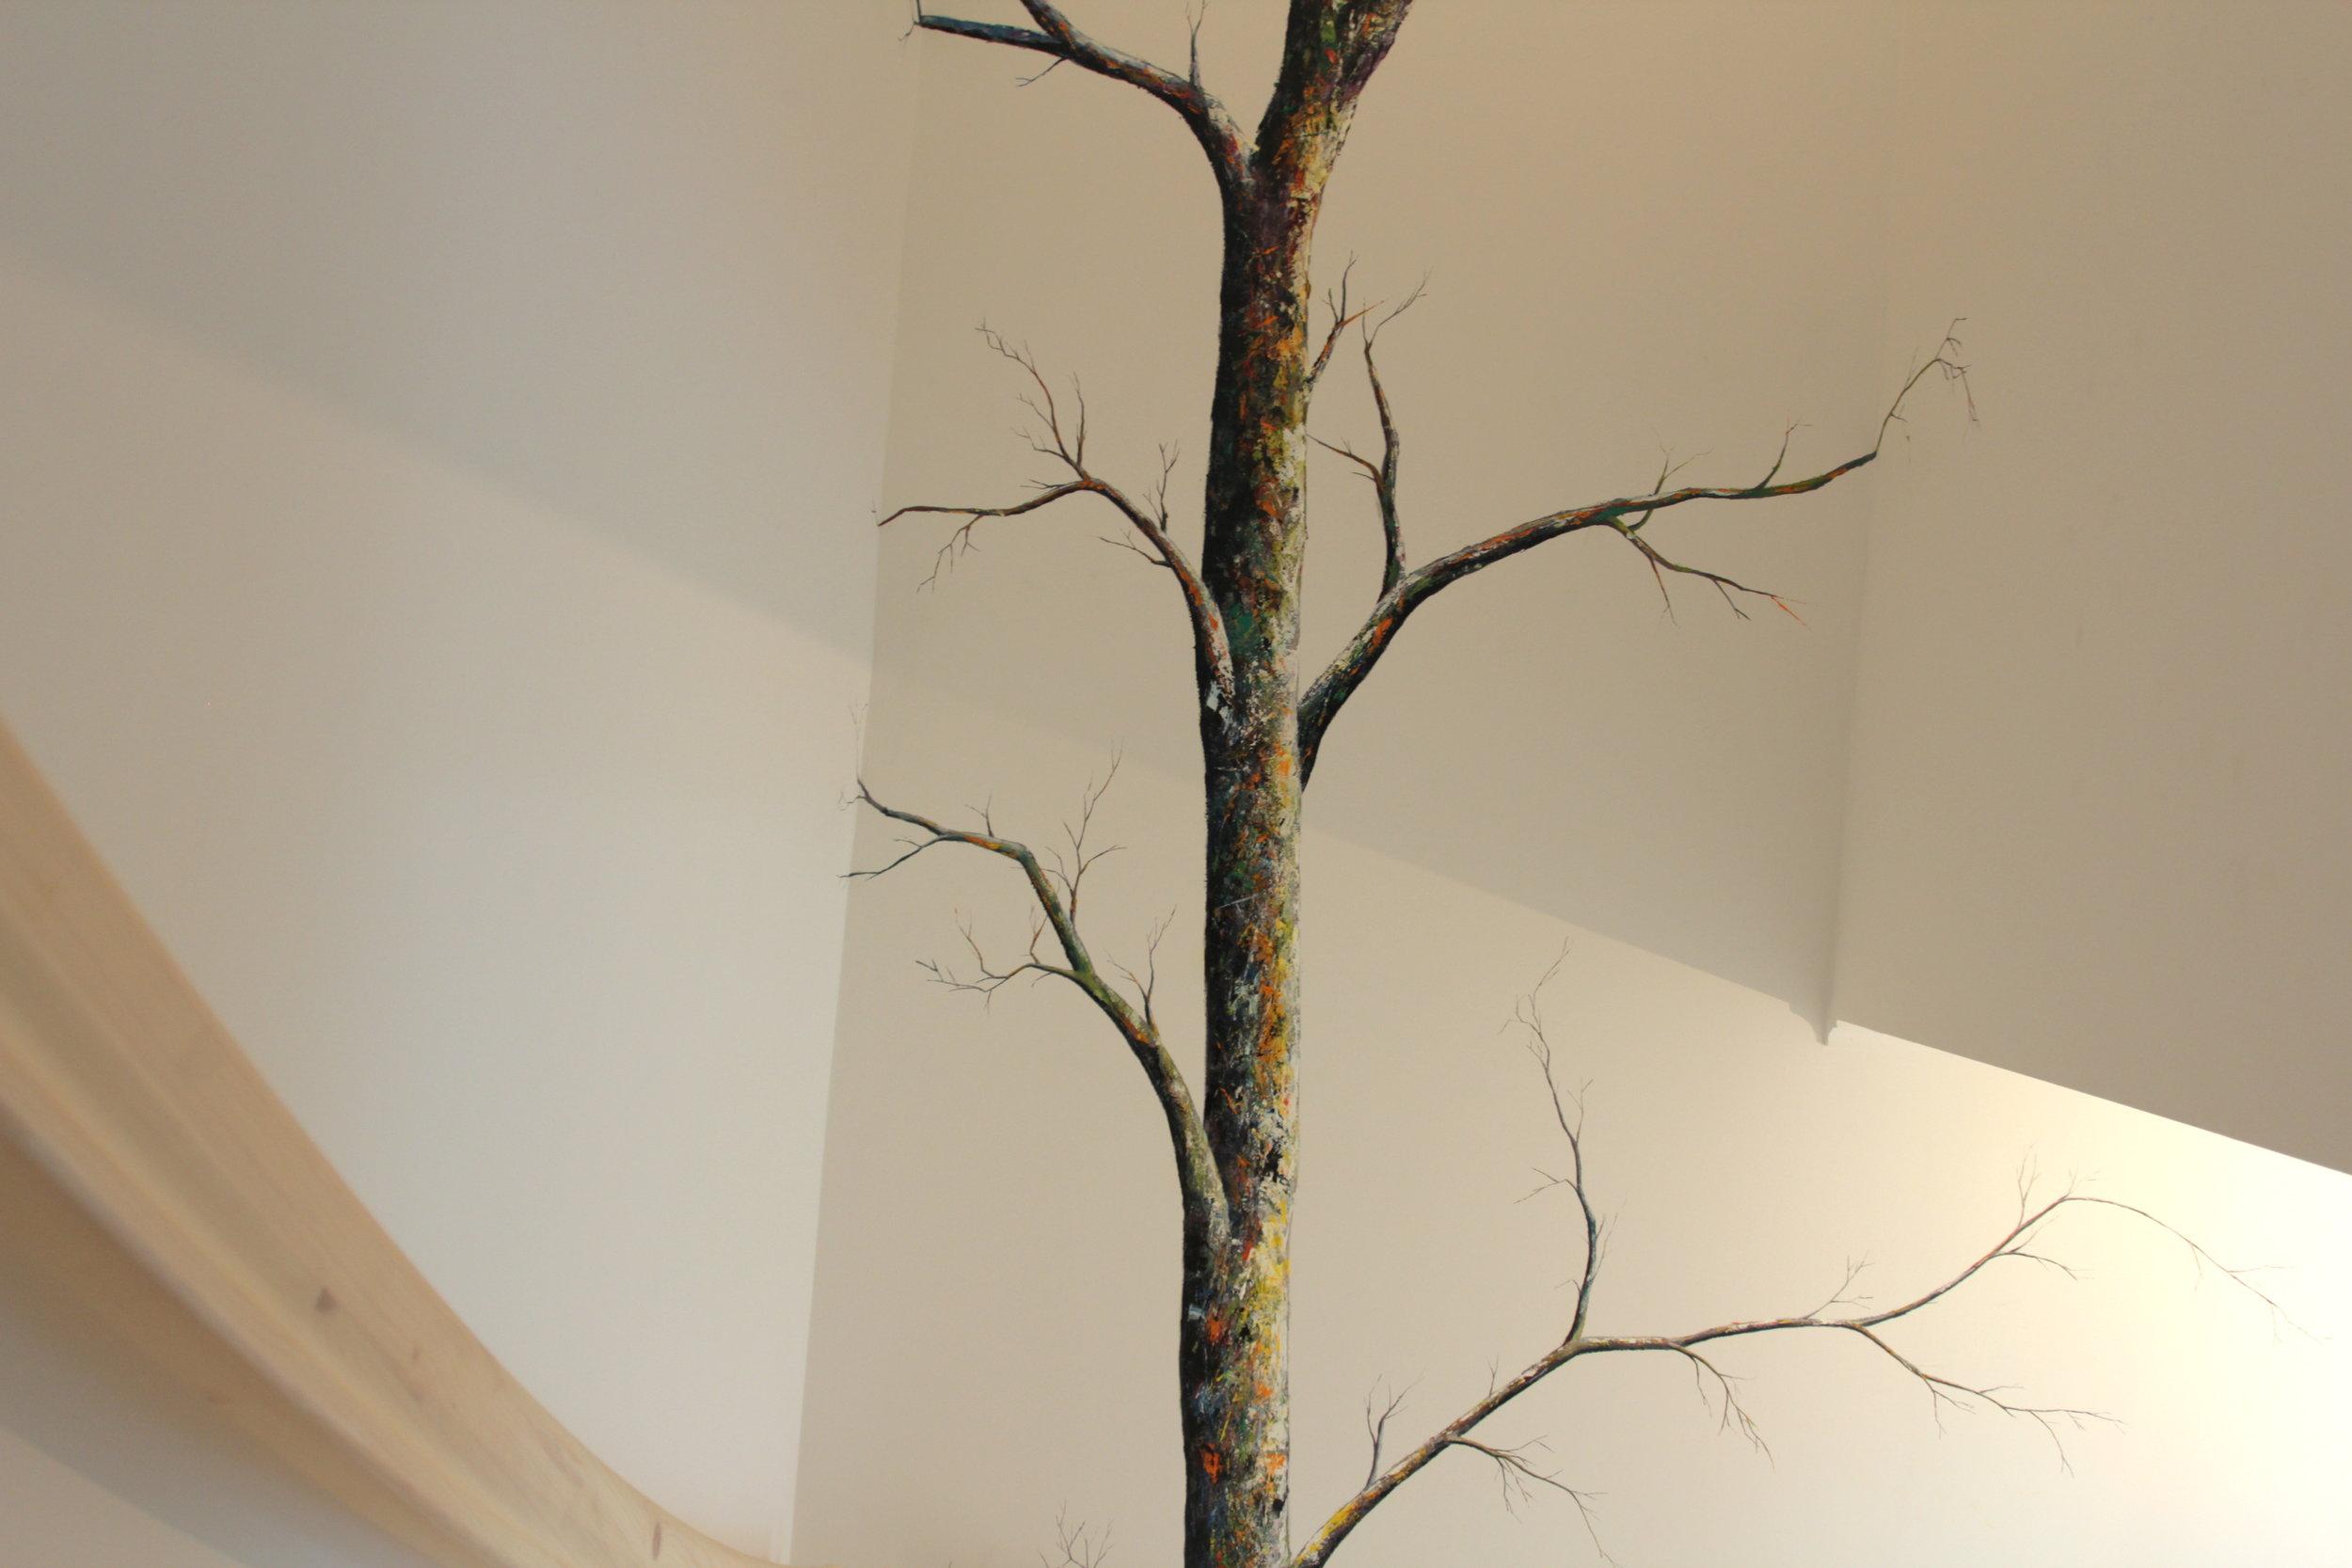 staffanträd2.JPG